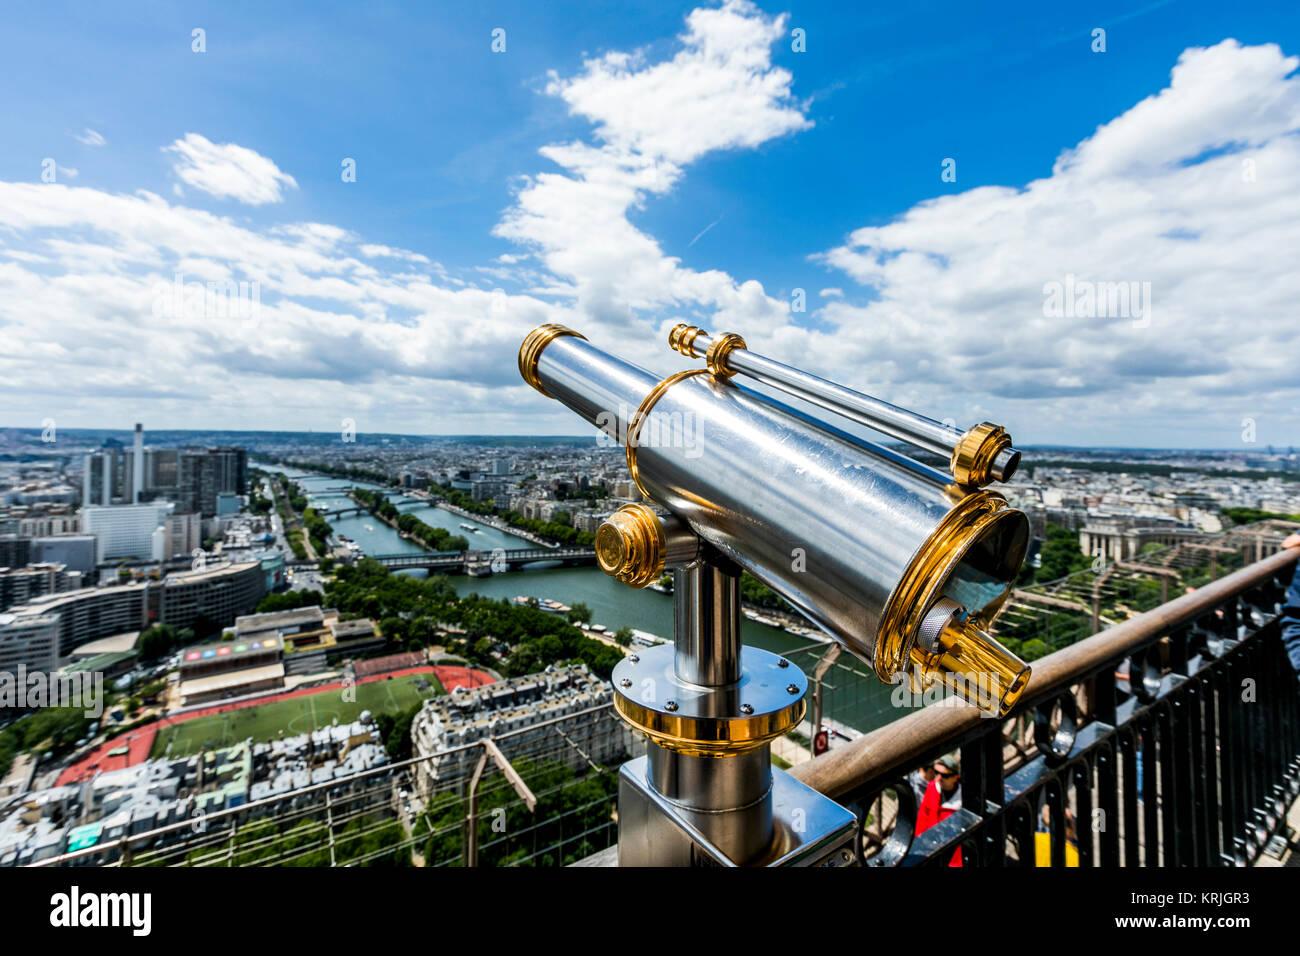 Telescope at scenic view of river in city, Paris, Ile de France, France - Stock Image